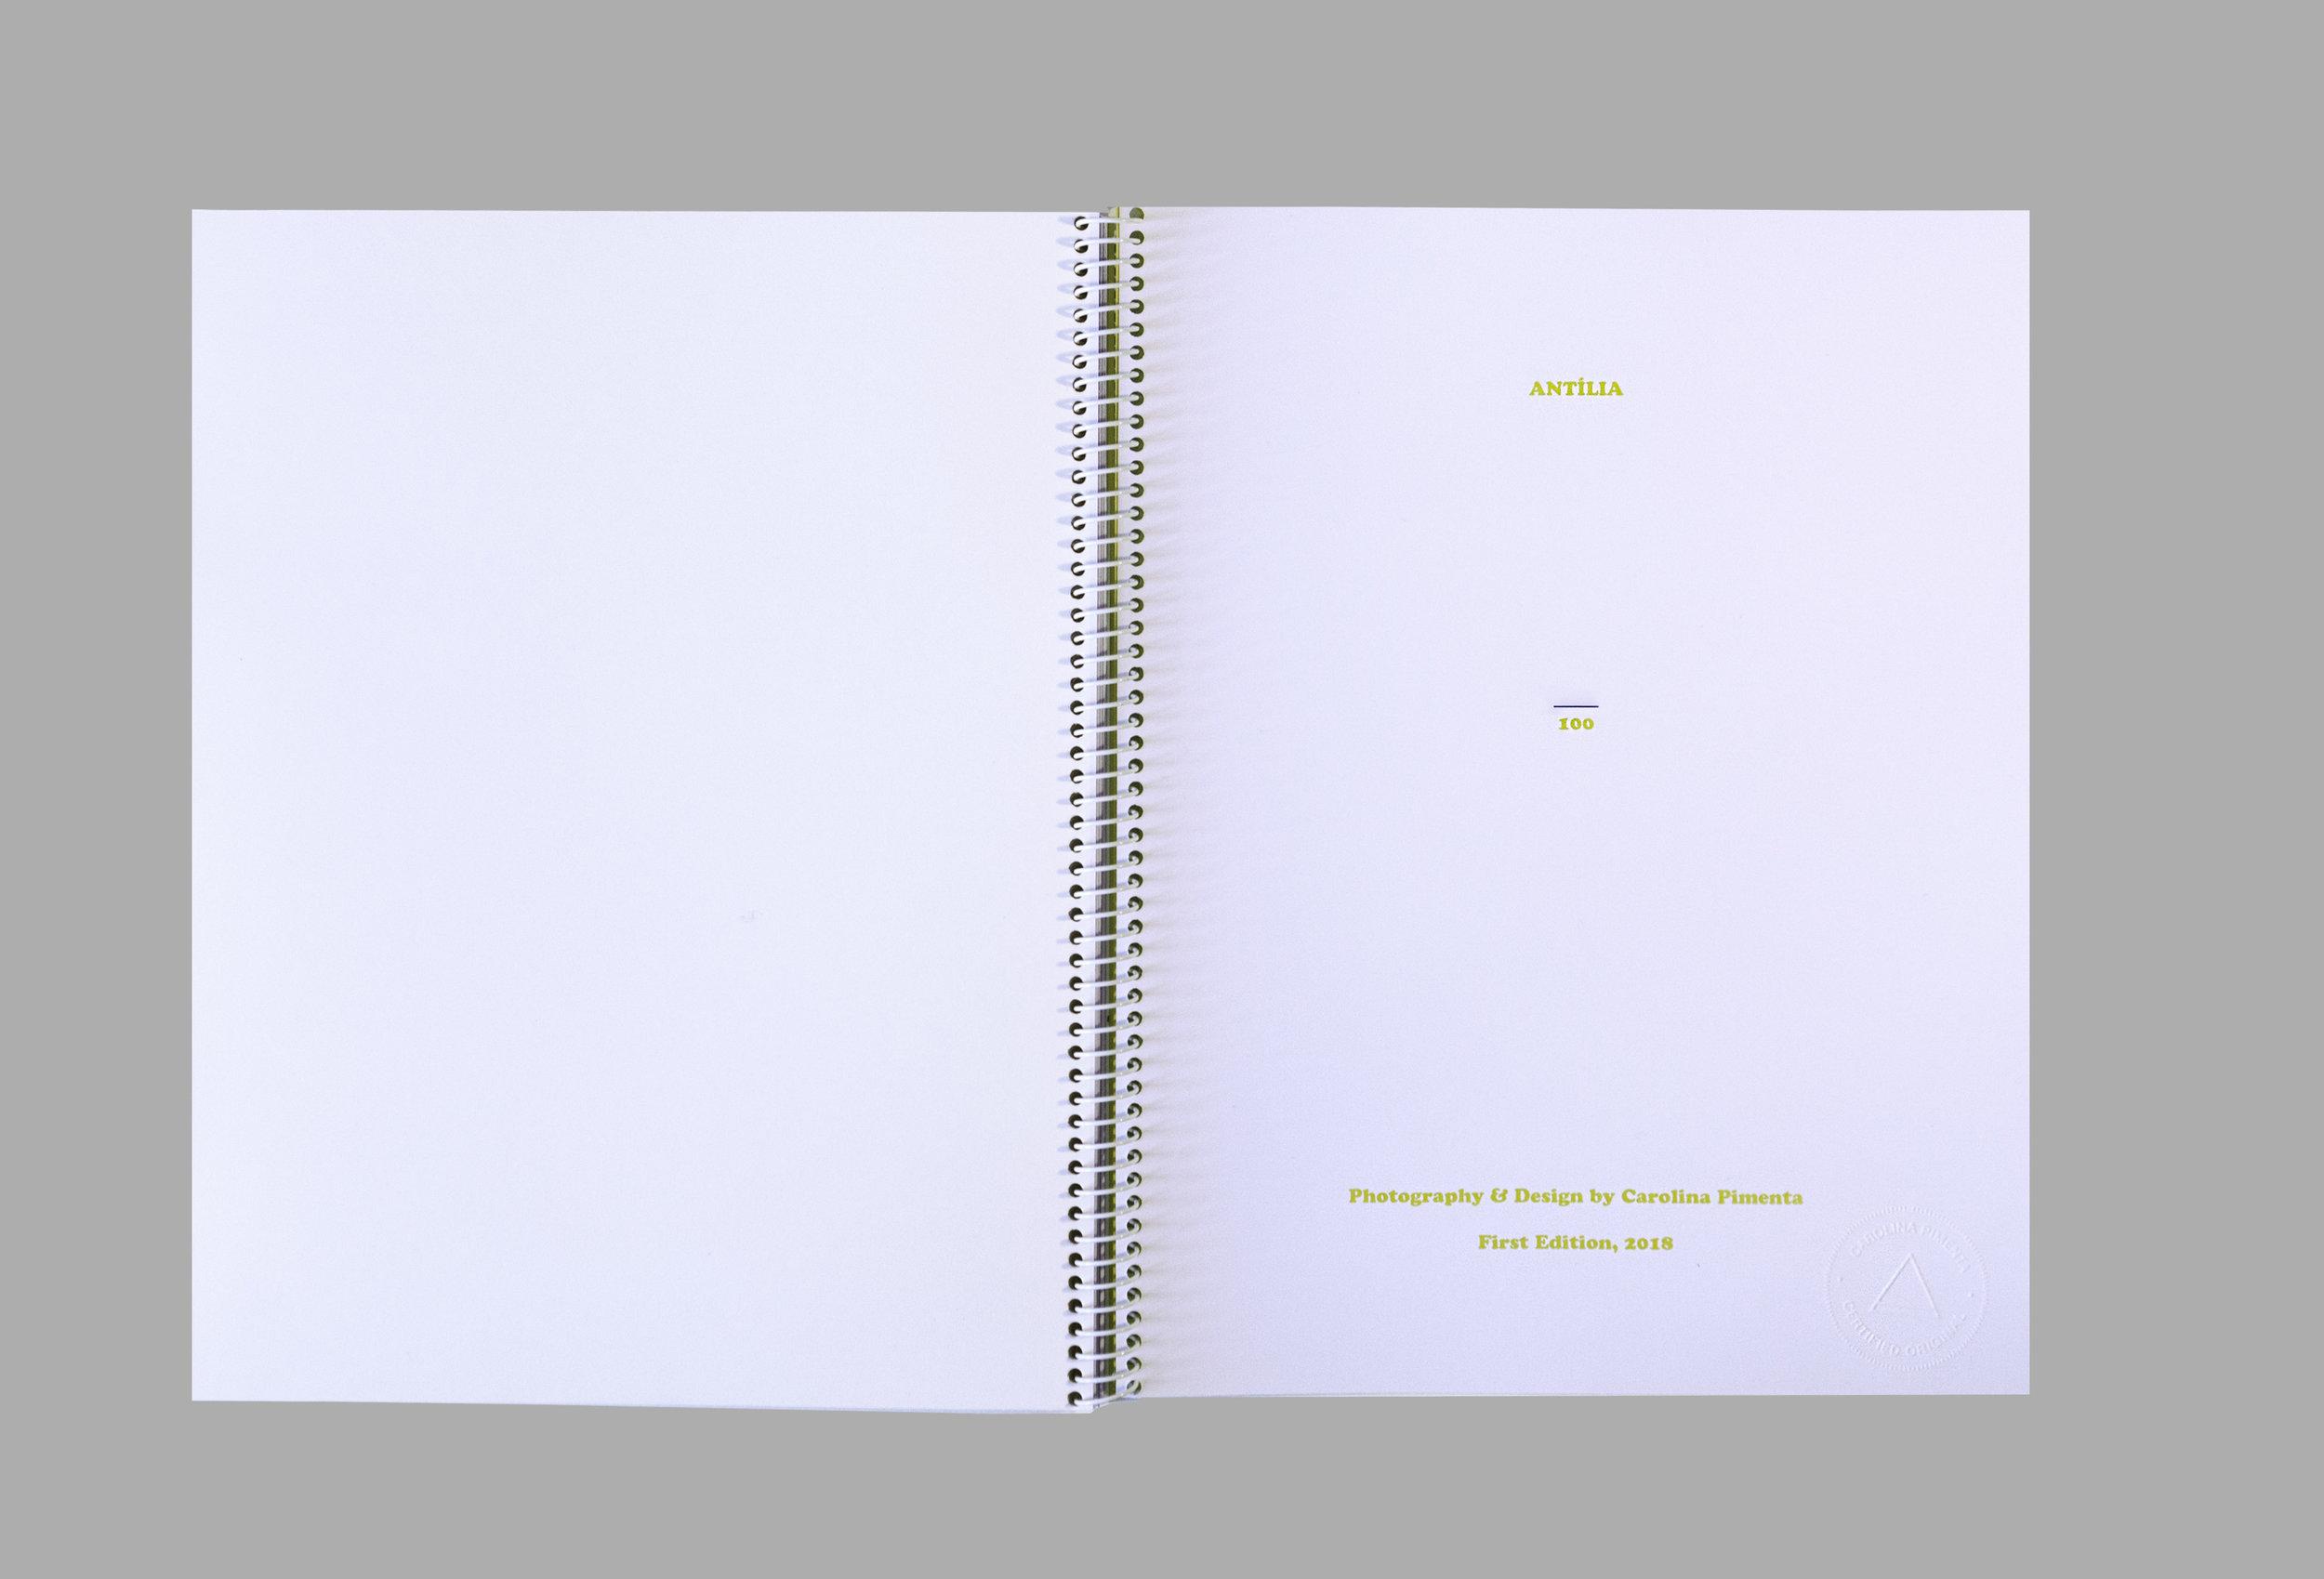 CP_ANTILIA_SPRIAL BOUND_PAGES_029.jpg